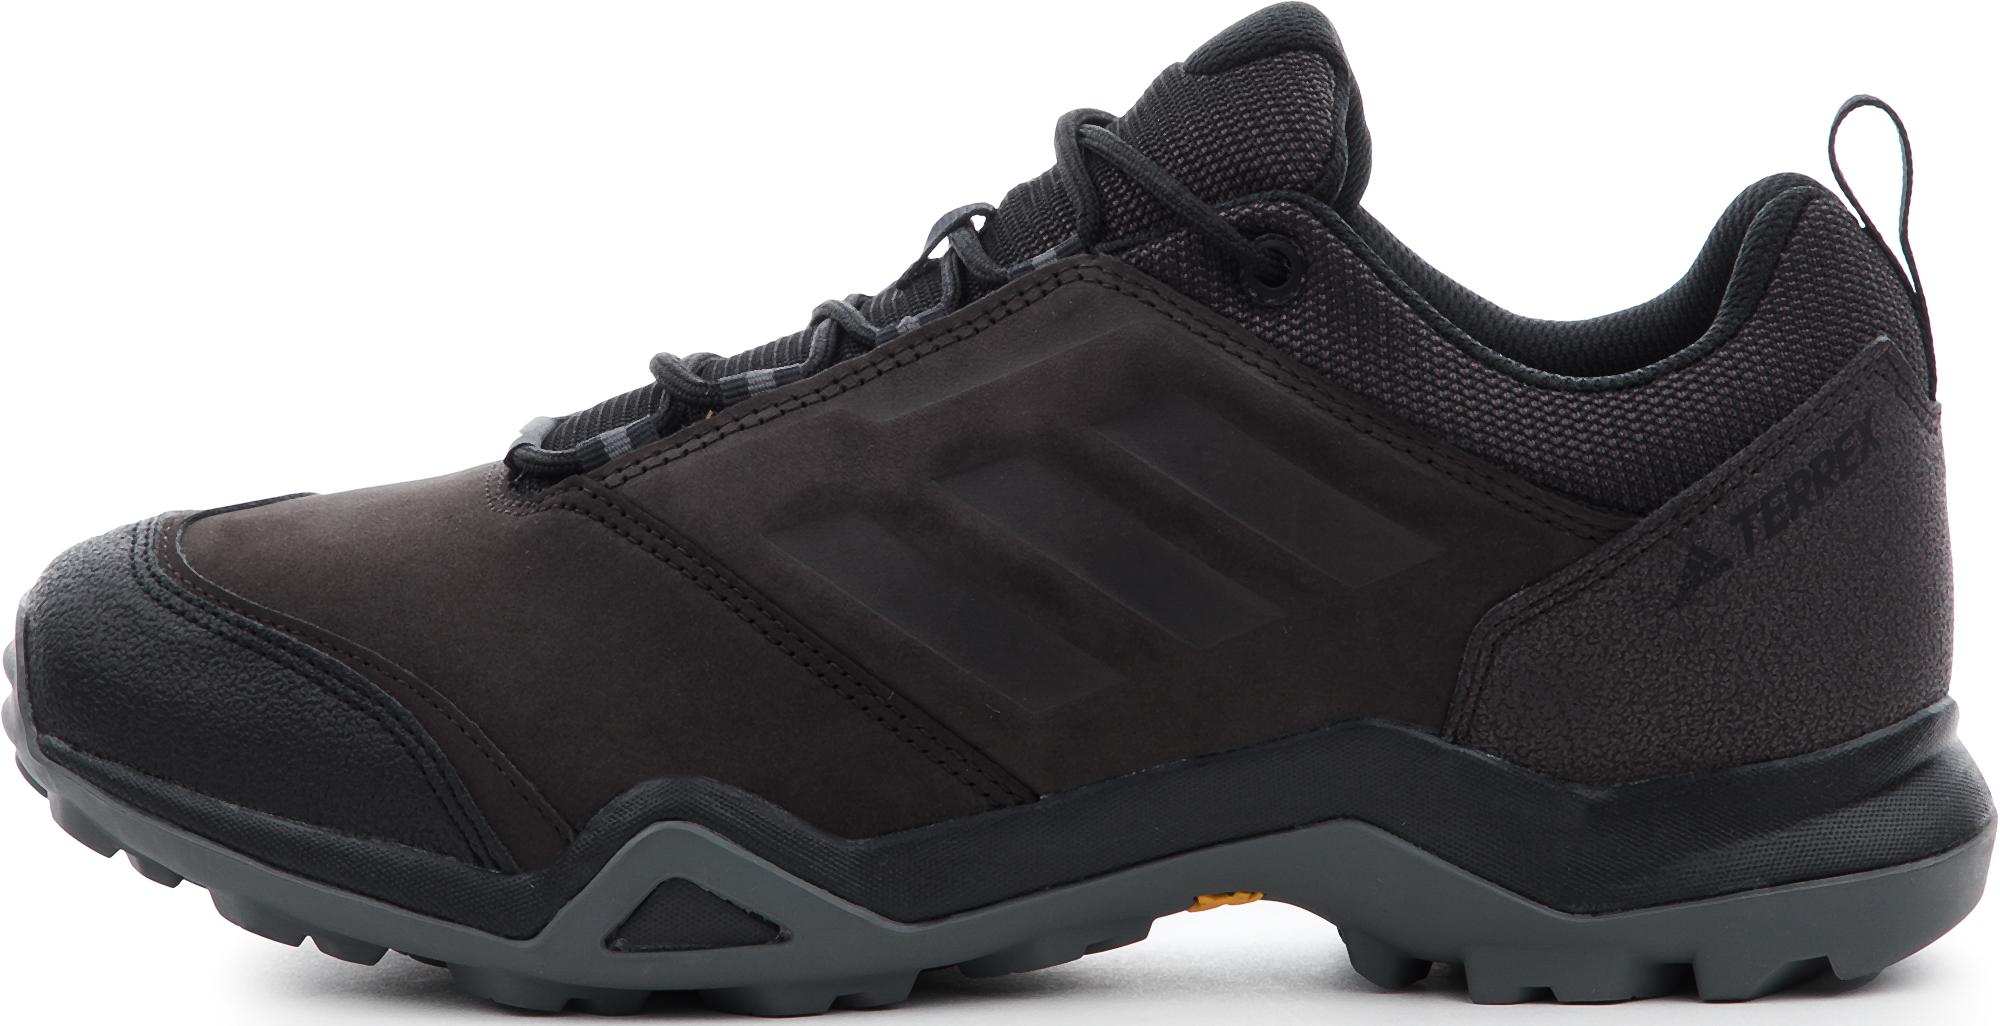 Adidas Полуботинки мужские Adidas Terrex Brushwood, размер 42 adidas ботинки мужские adidas terrex tivid mid climaproof размер 40